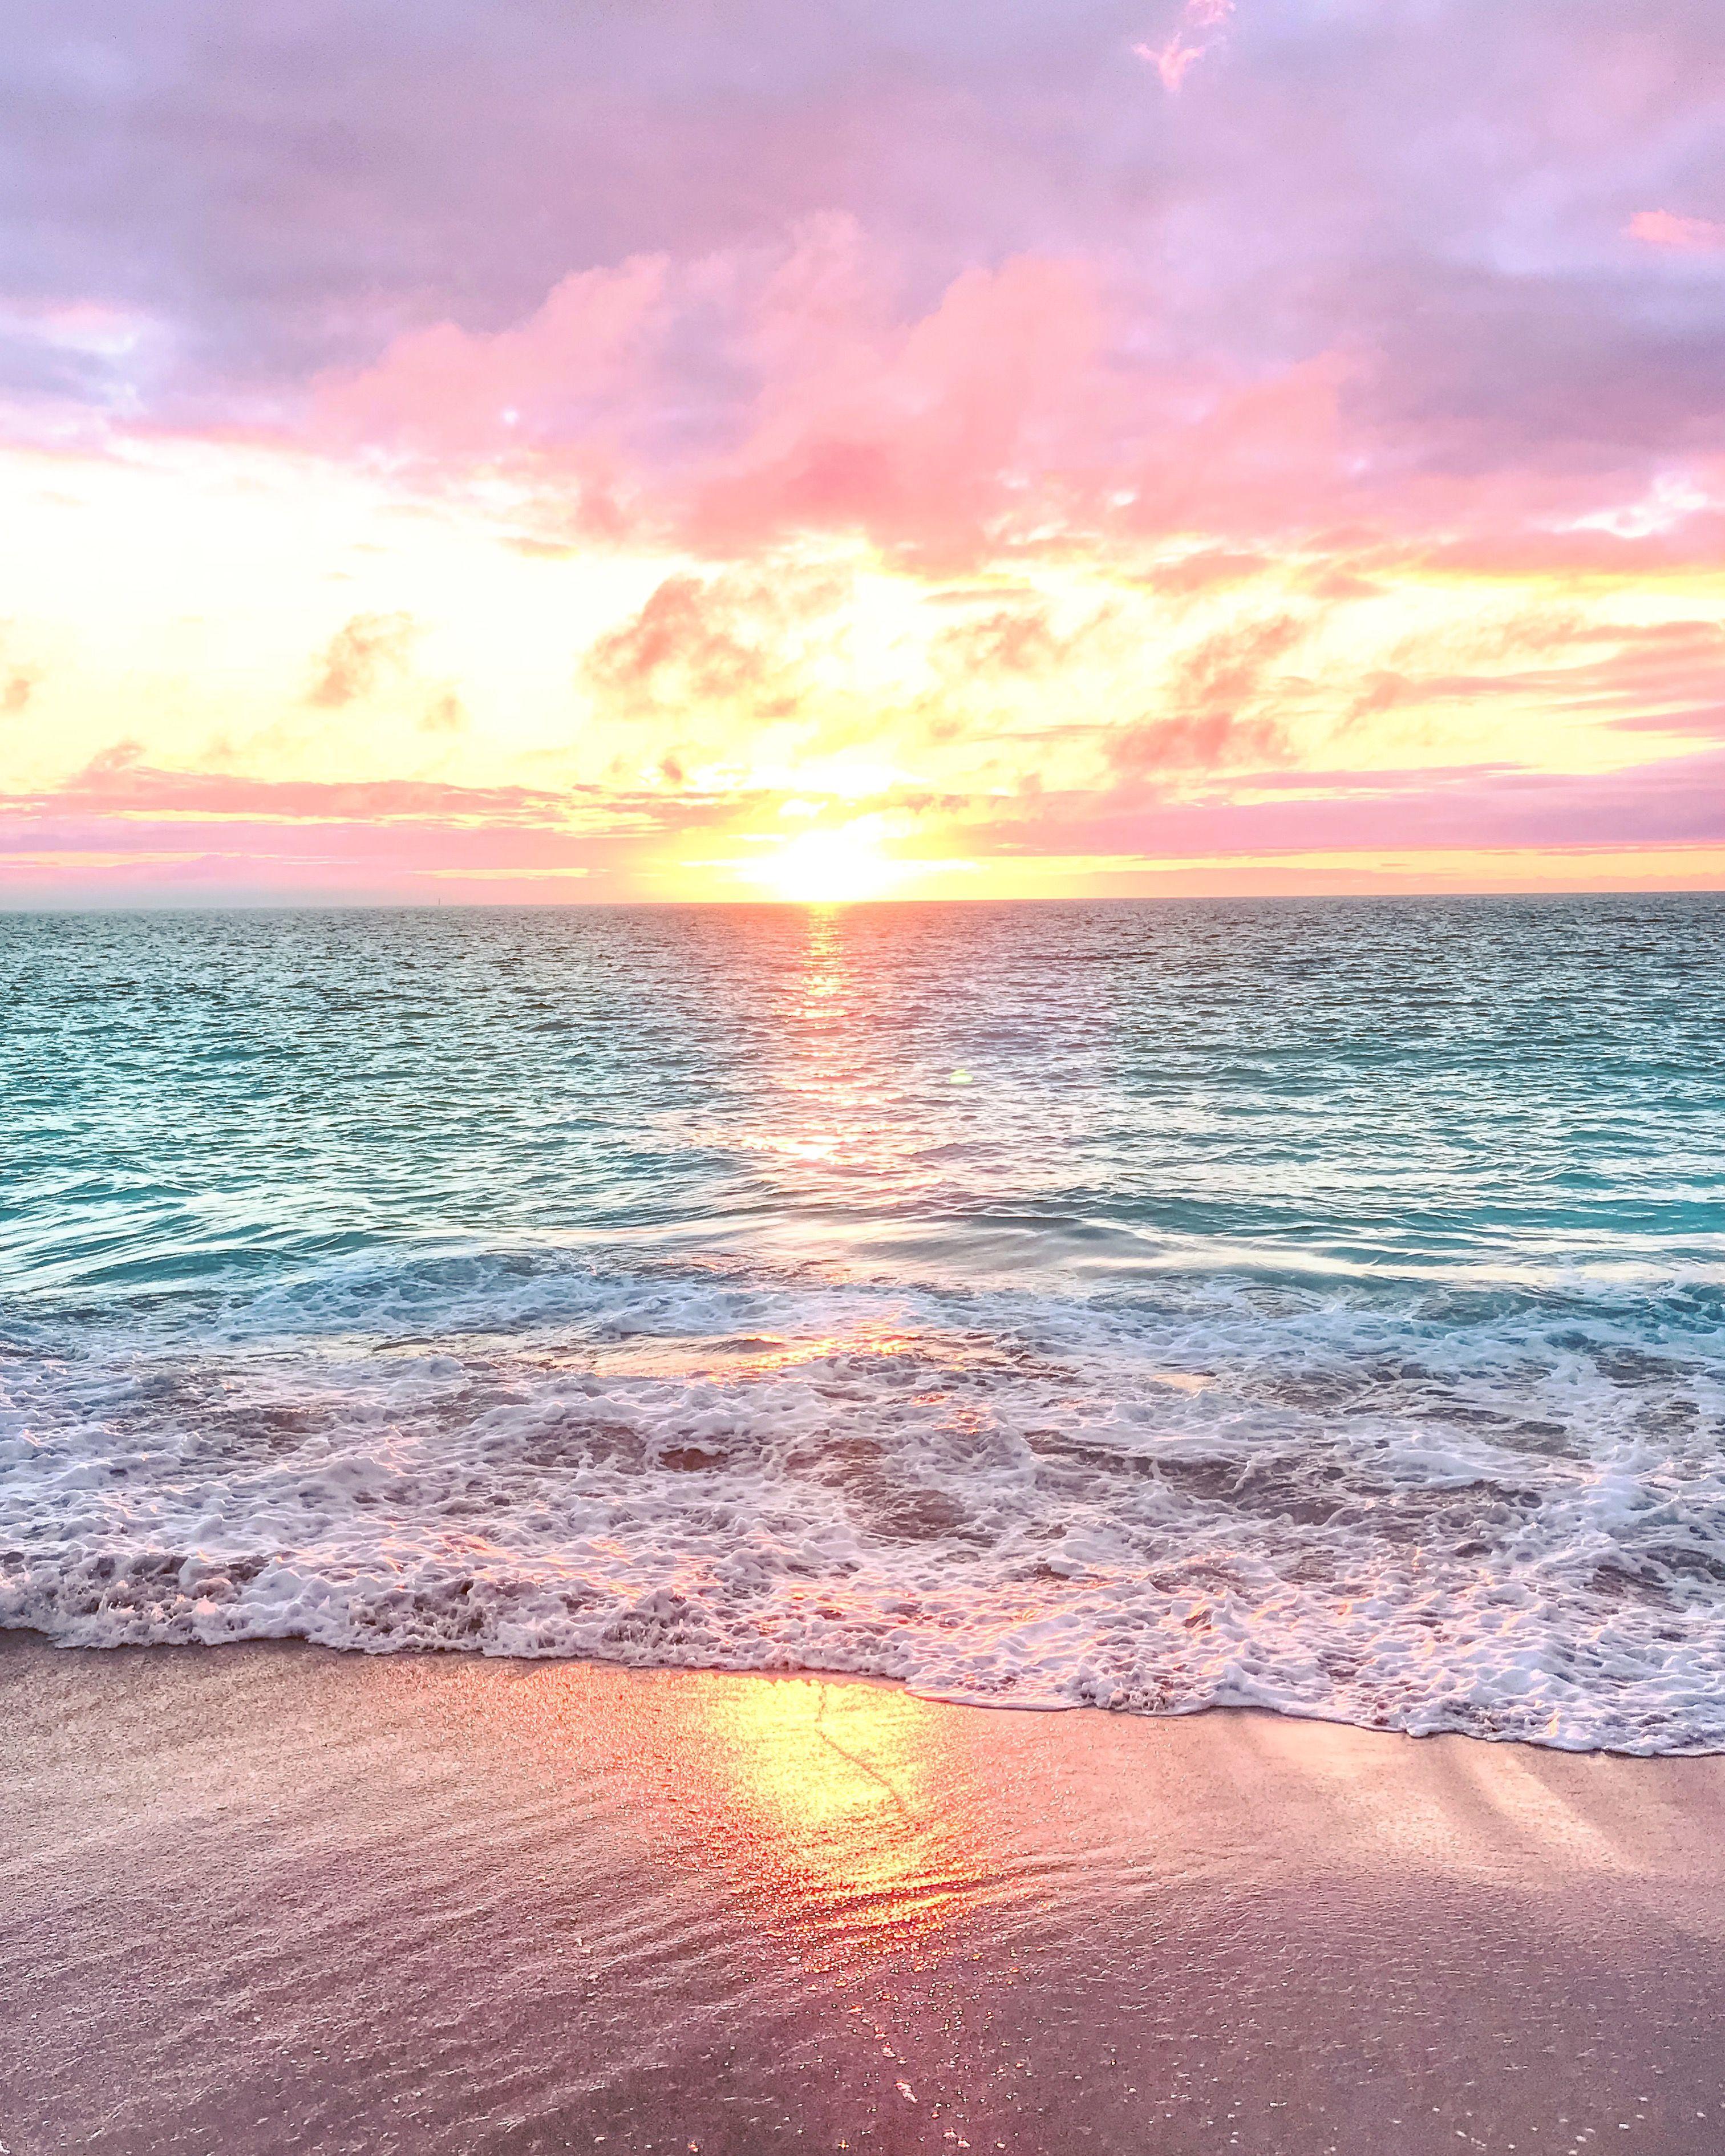 North Beach Wa Pc Gypsylovinlight My Aesthetic Pastel Sunset Beach Sunset Wallpaper Pastel Sunset Beach Wallpaper